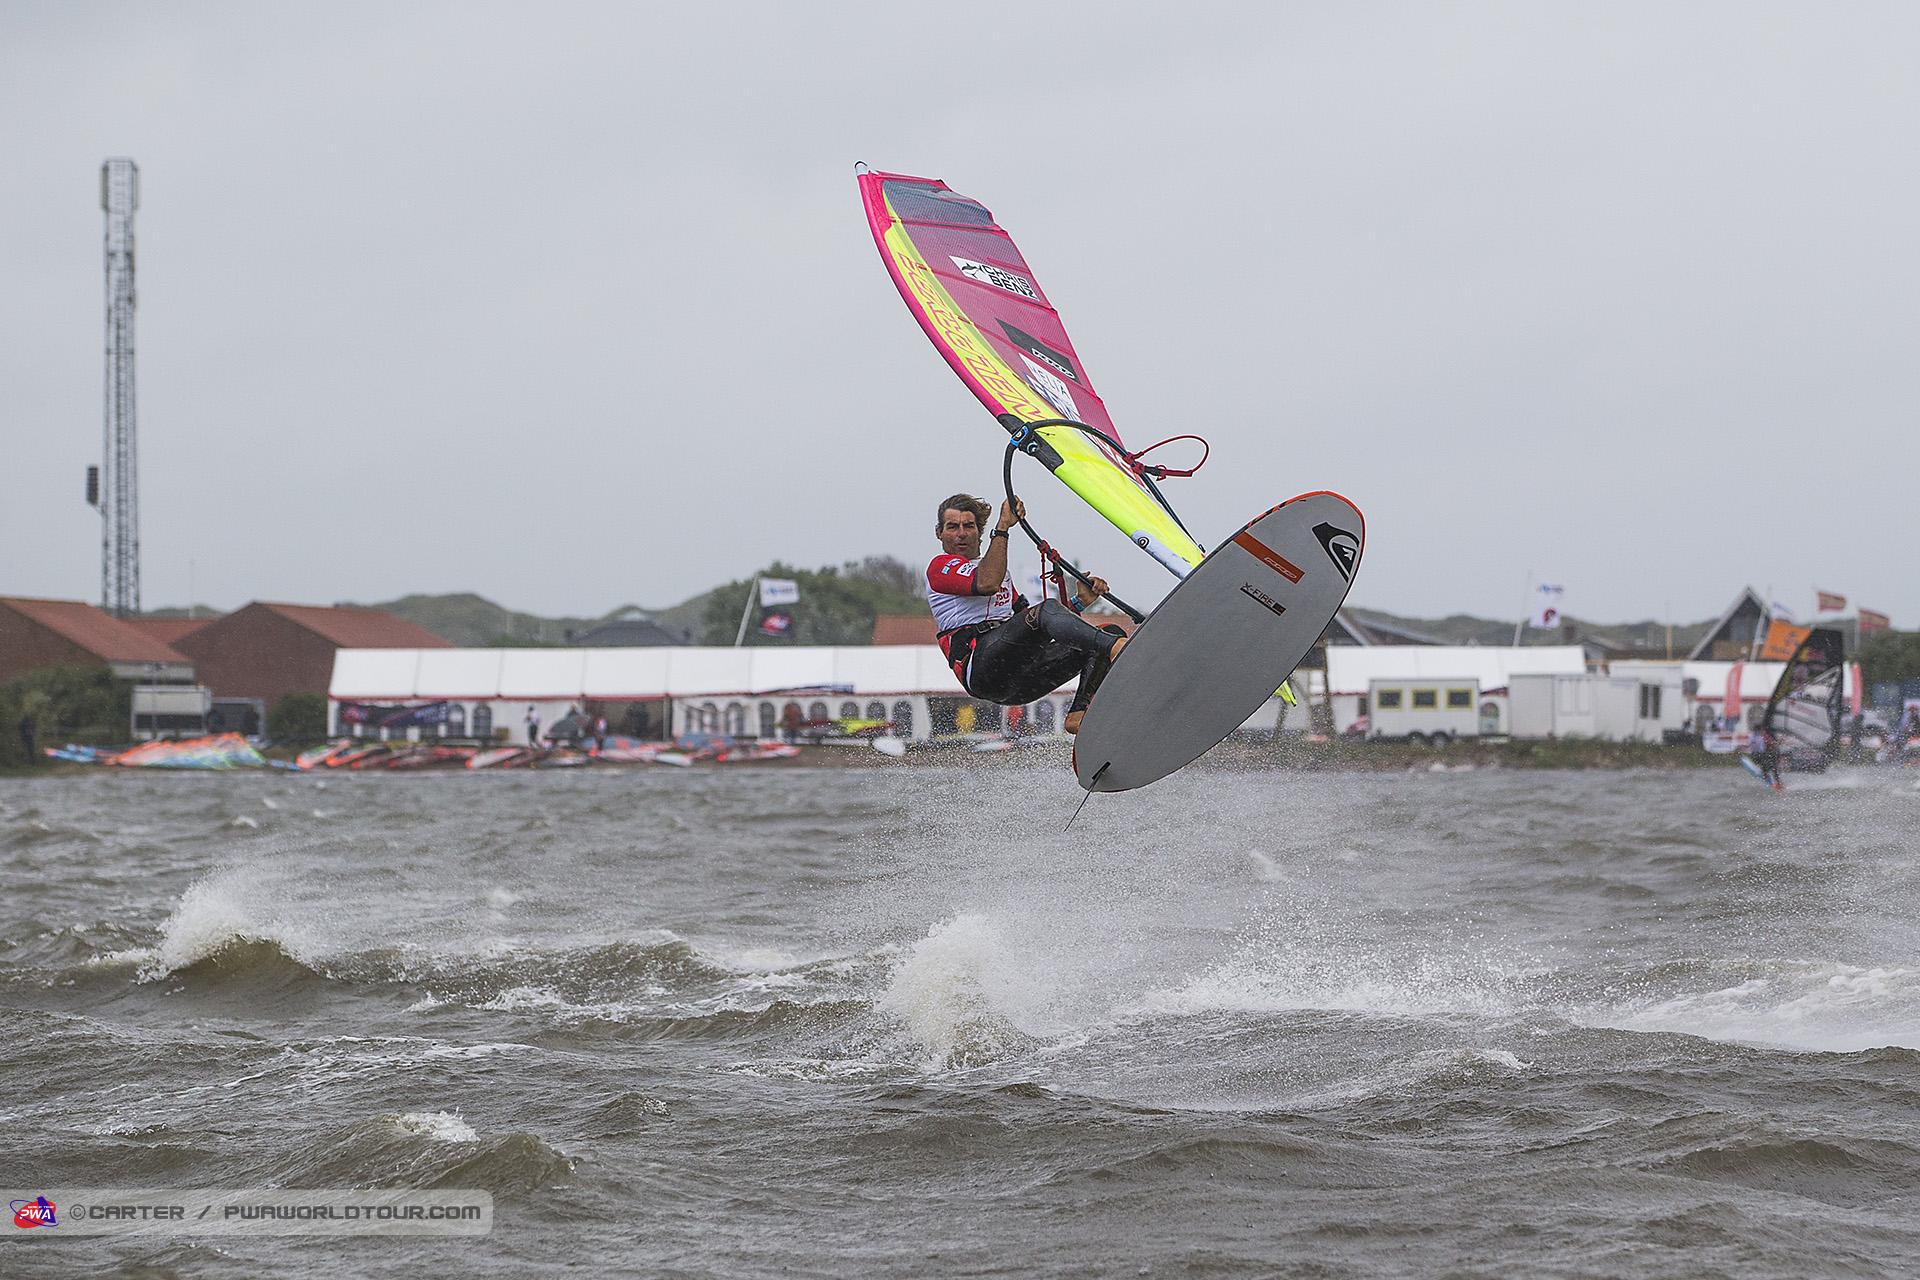 DK17_sl_Albeau_Jumps.jpg